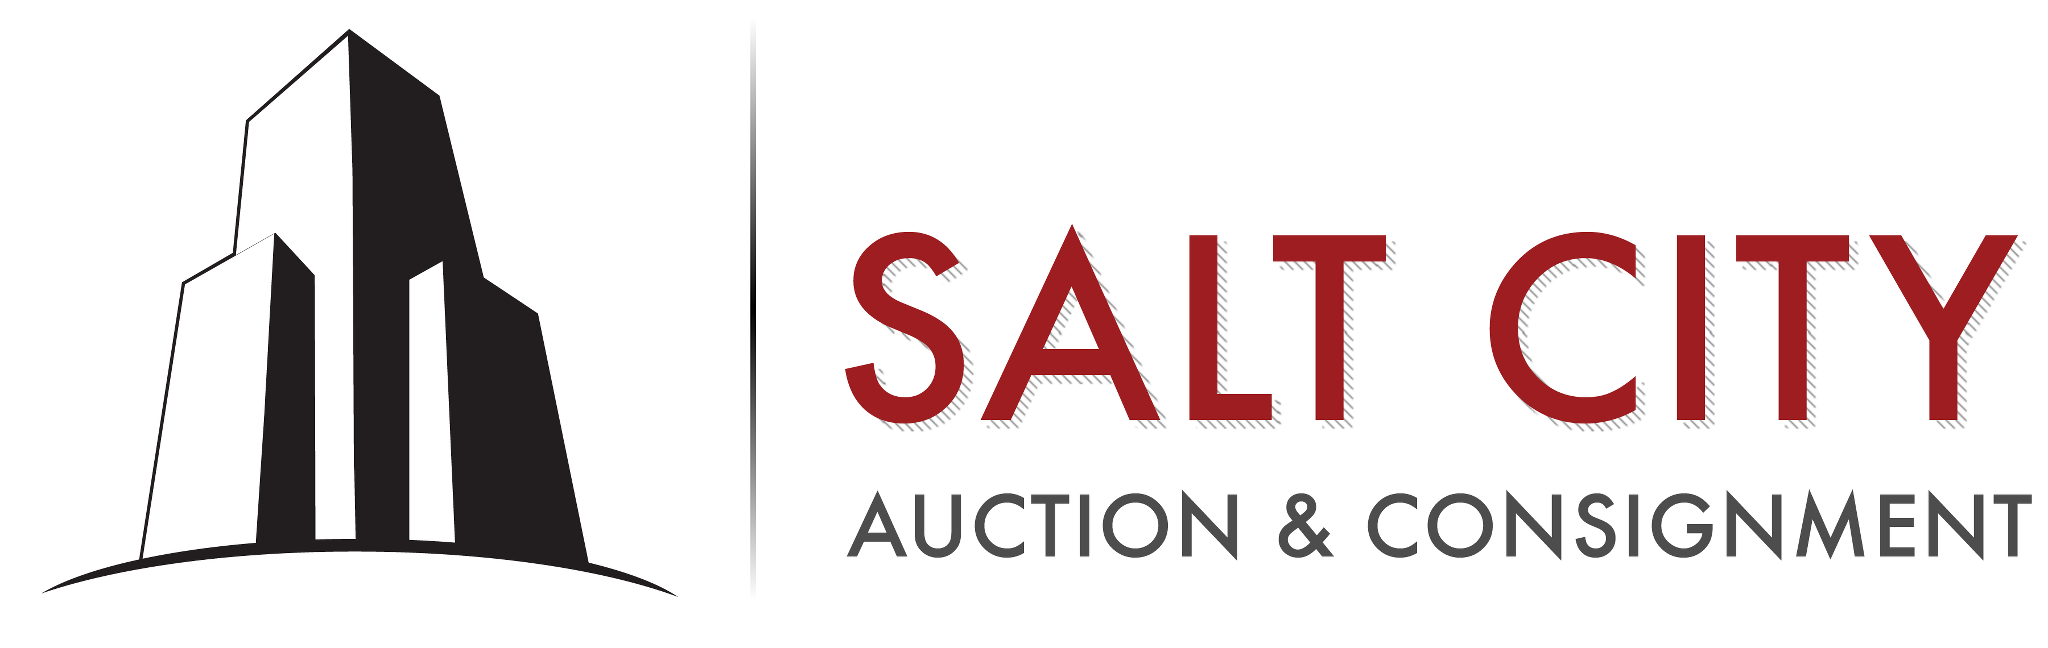 Salt City Consignment Store & Auction - ad image